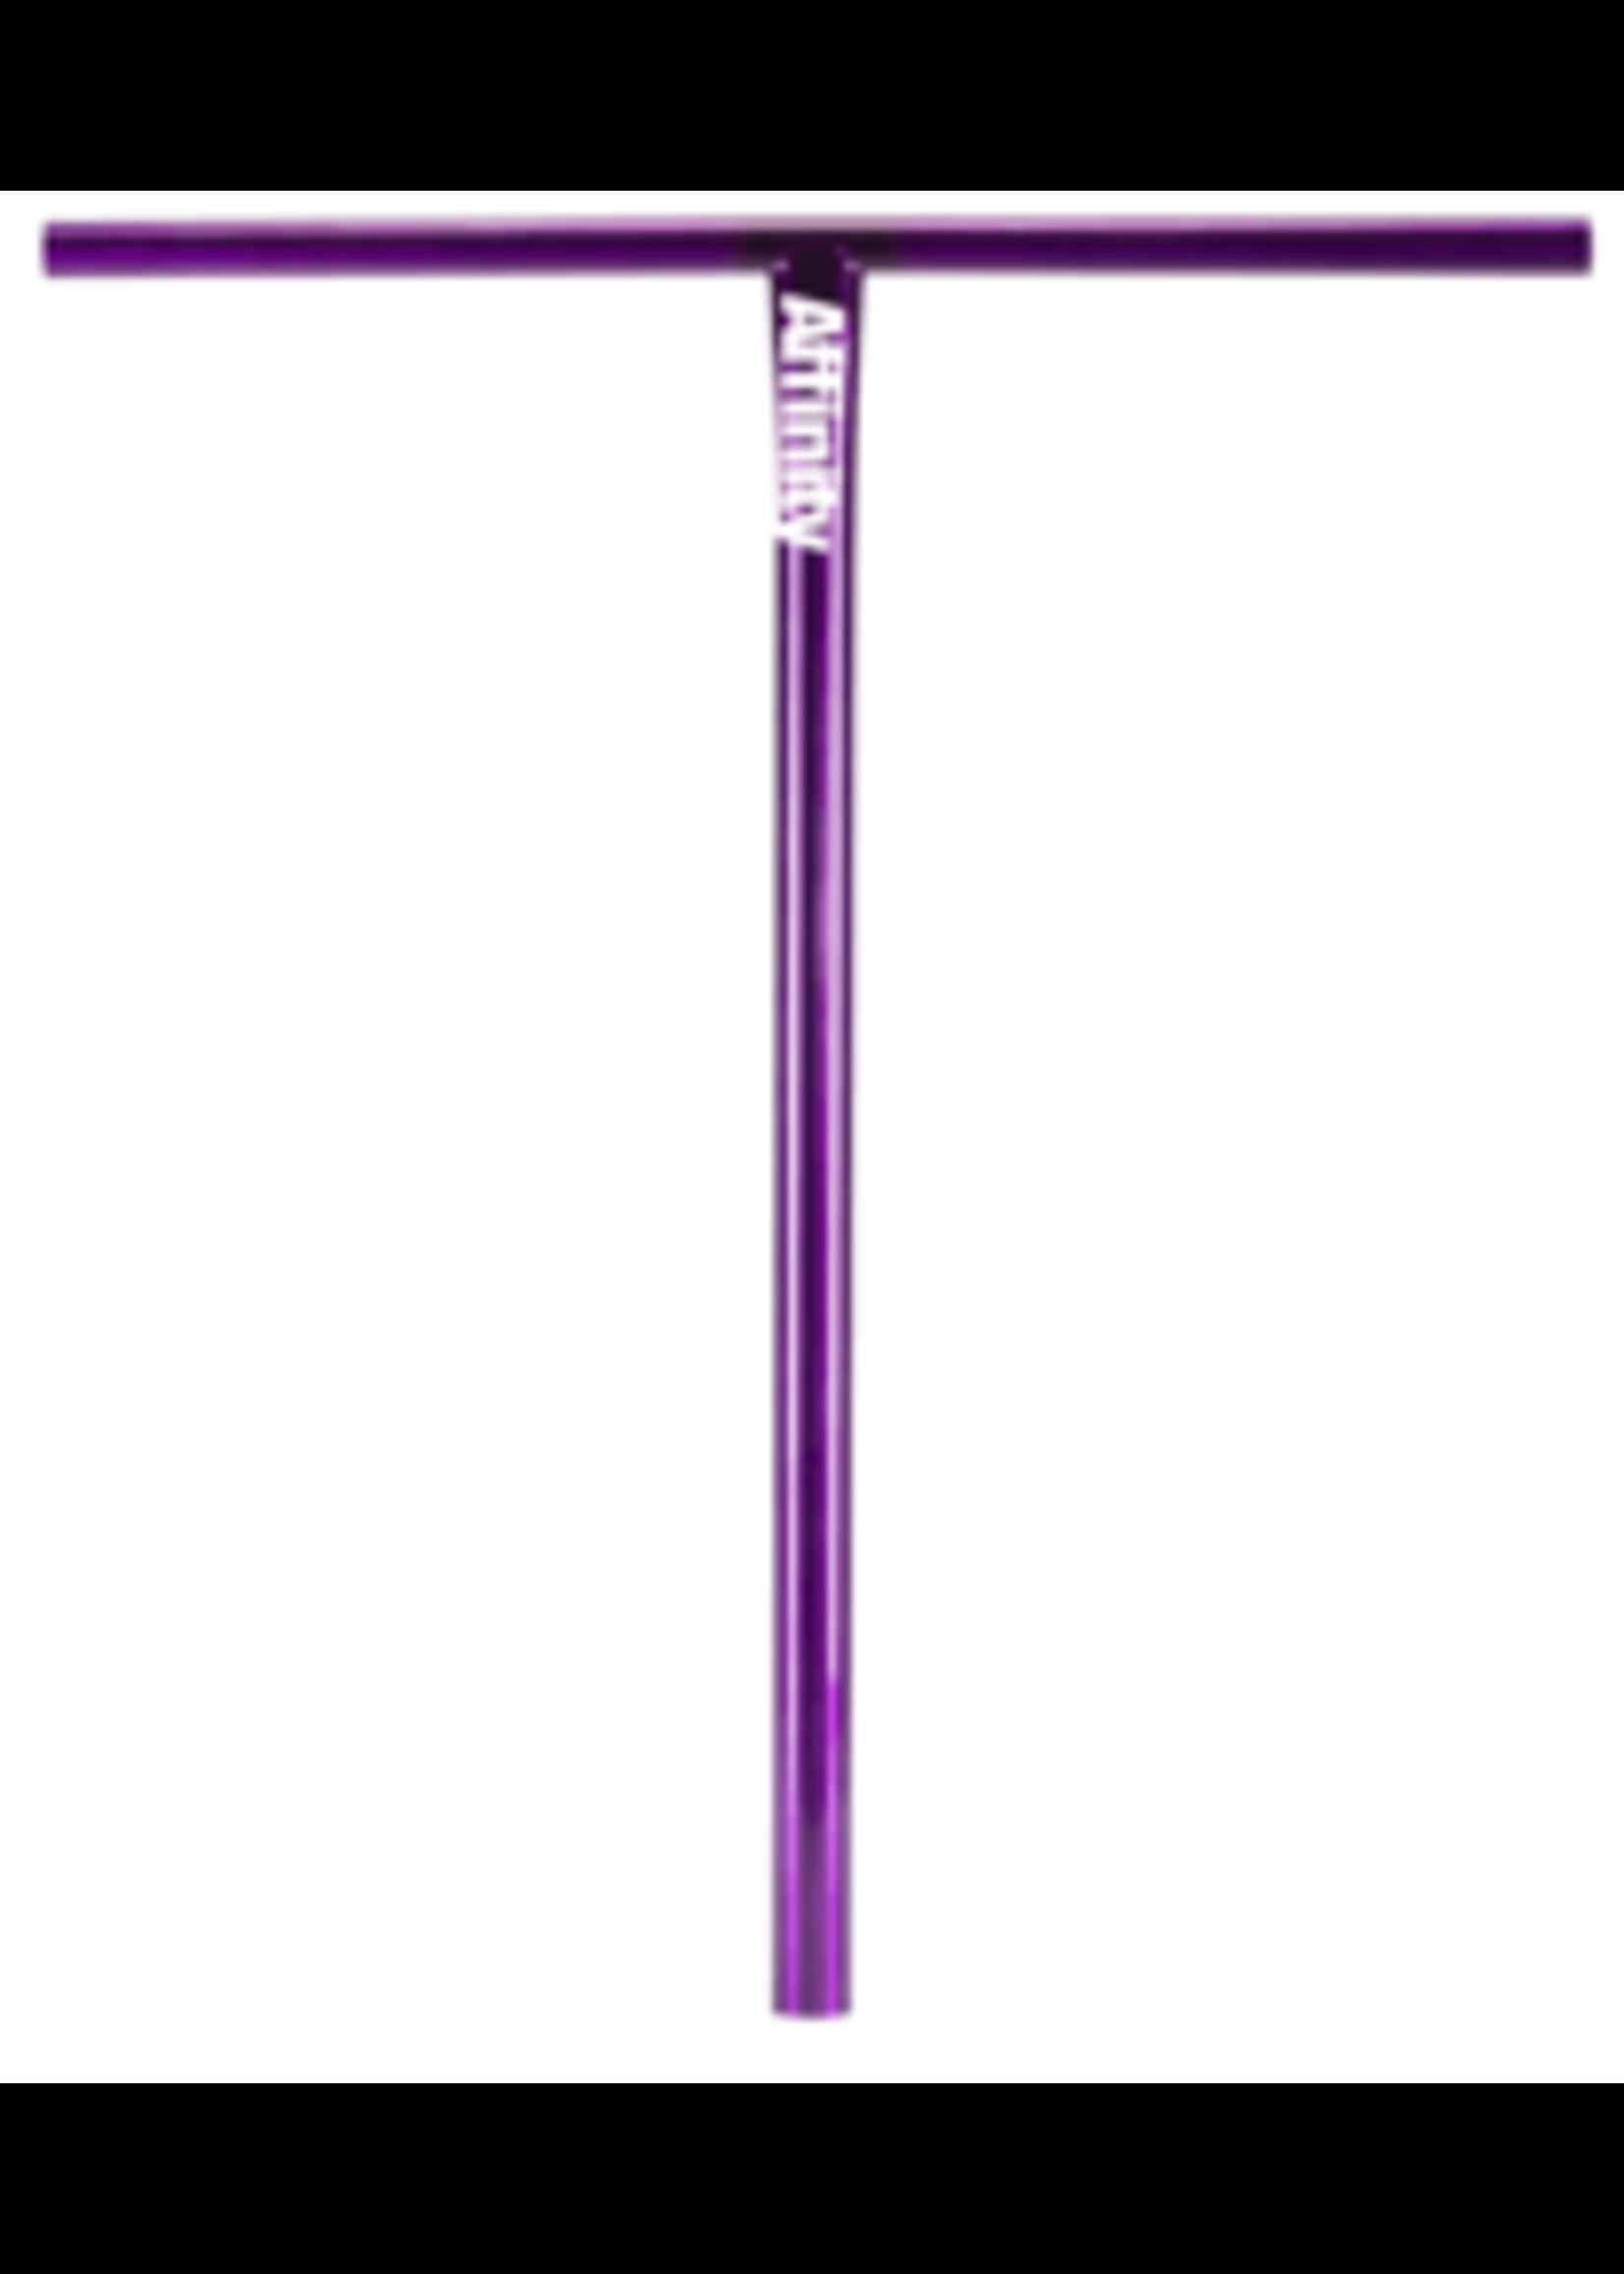 Affinity Affinity - Classic XL Tbar - Standard